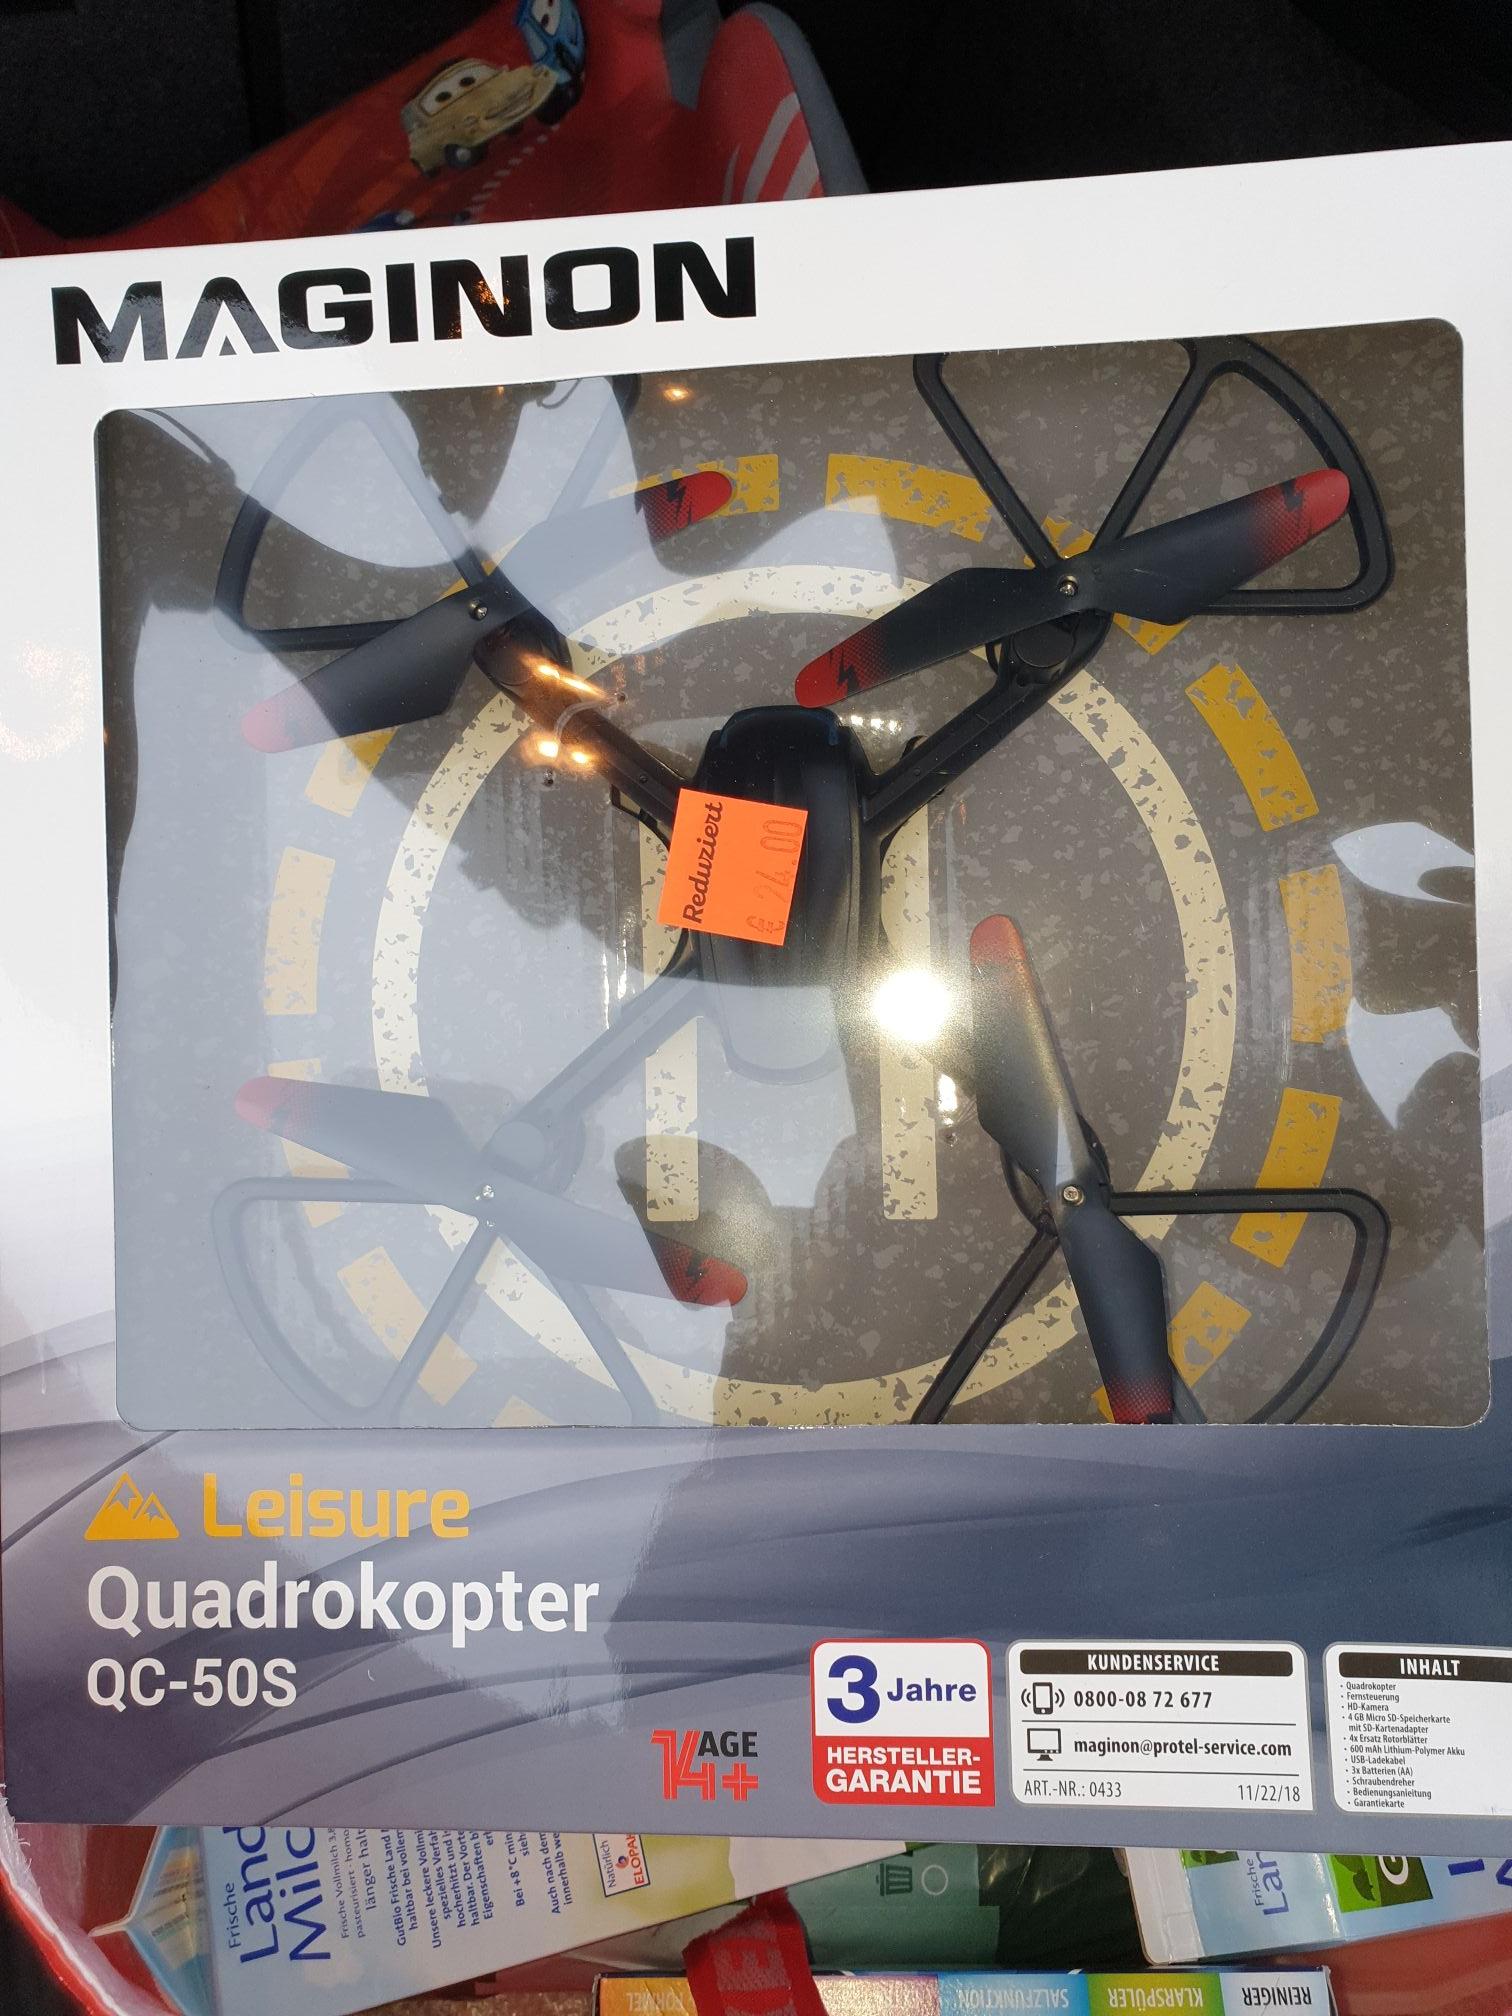 Quadrocopter leisure qs 50 s